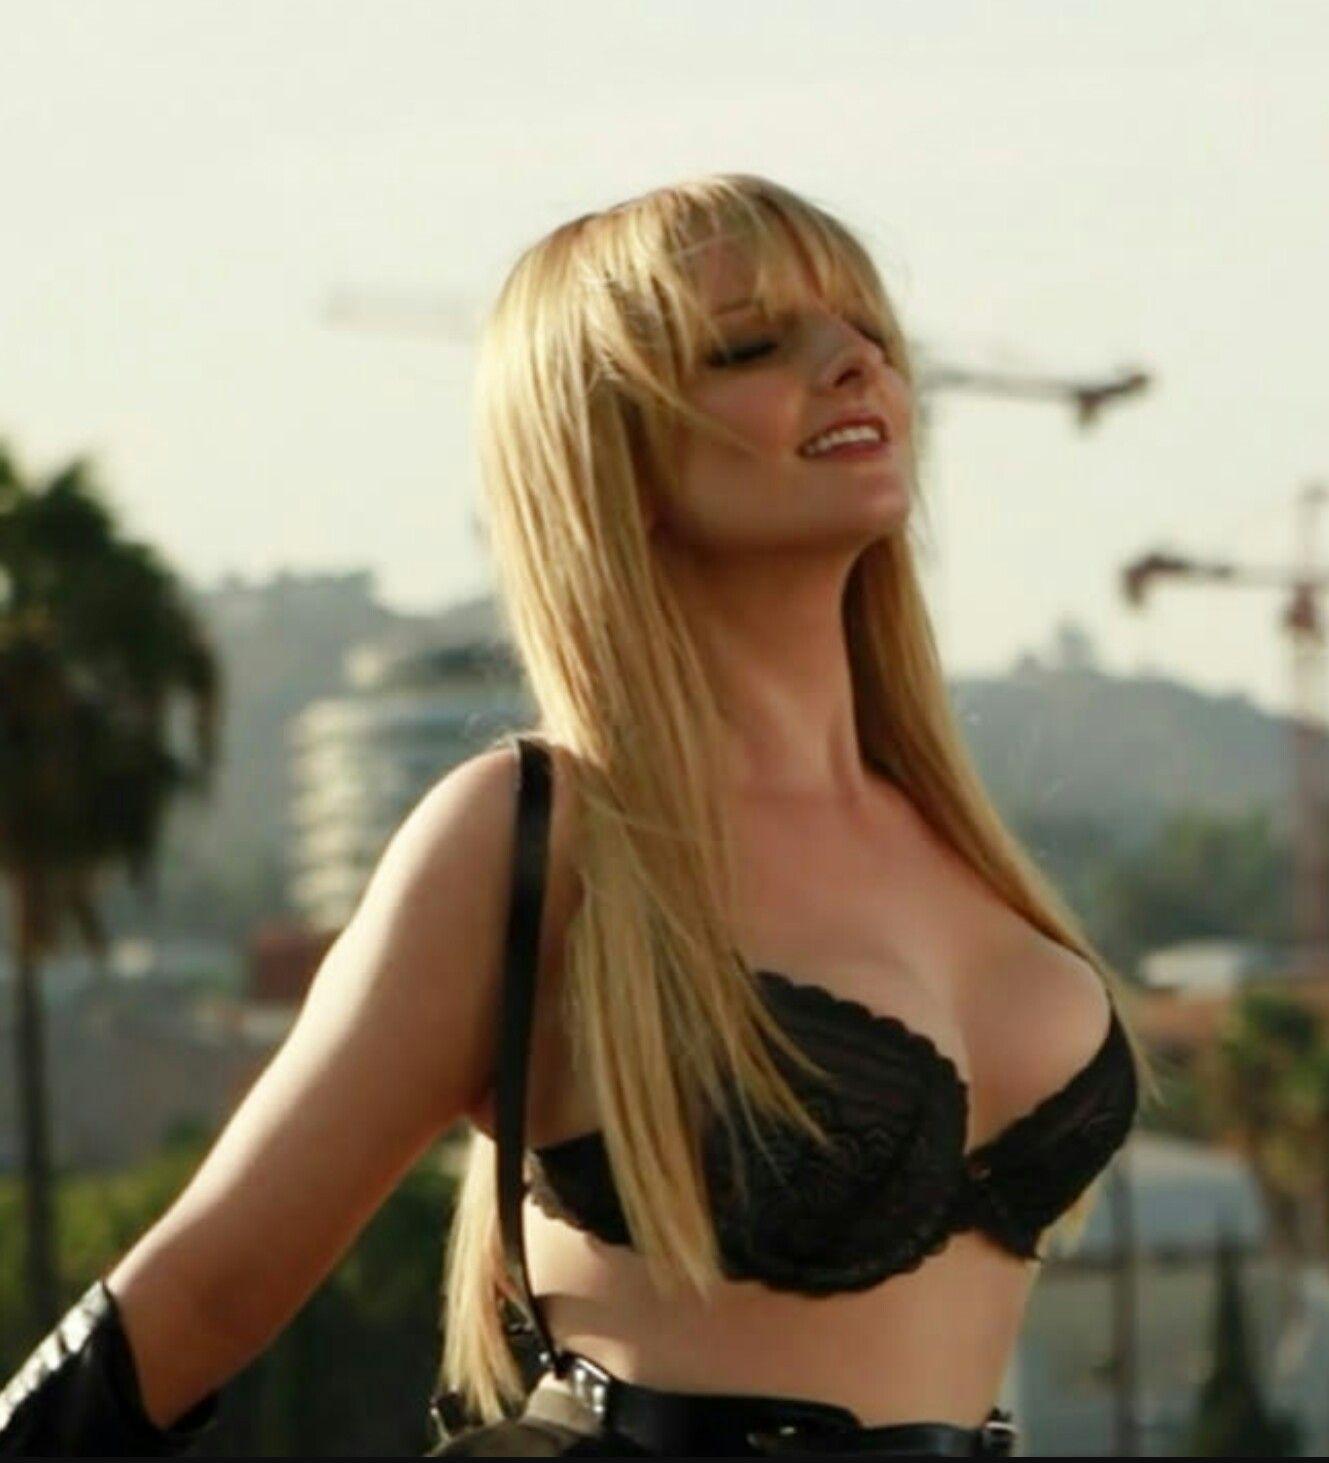 Hot sex scene between a sexy virgin and prof actor 7